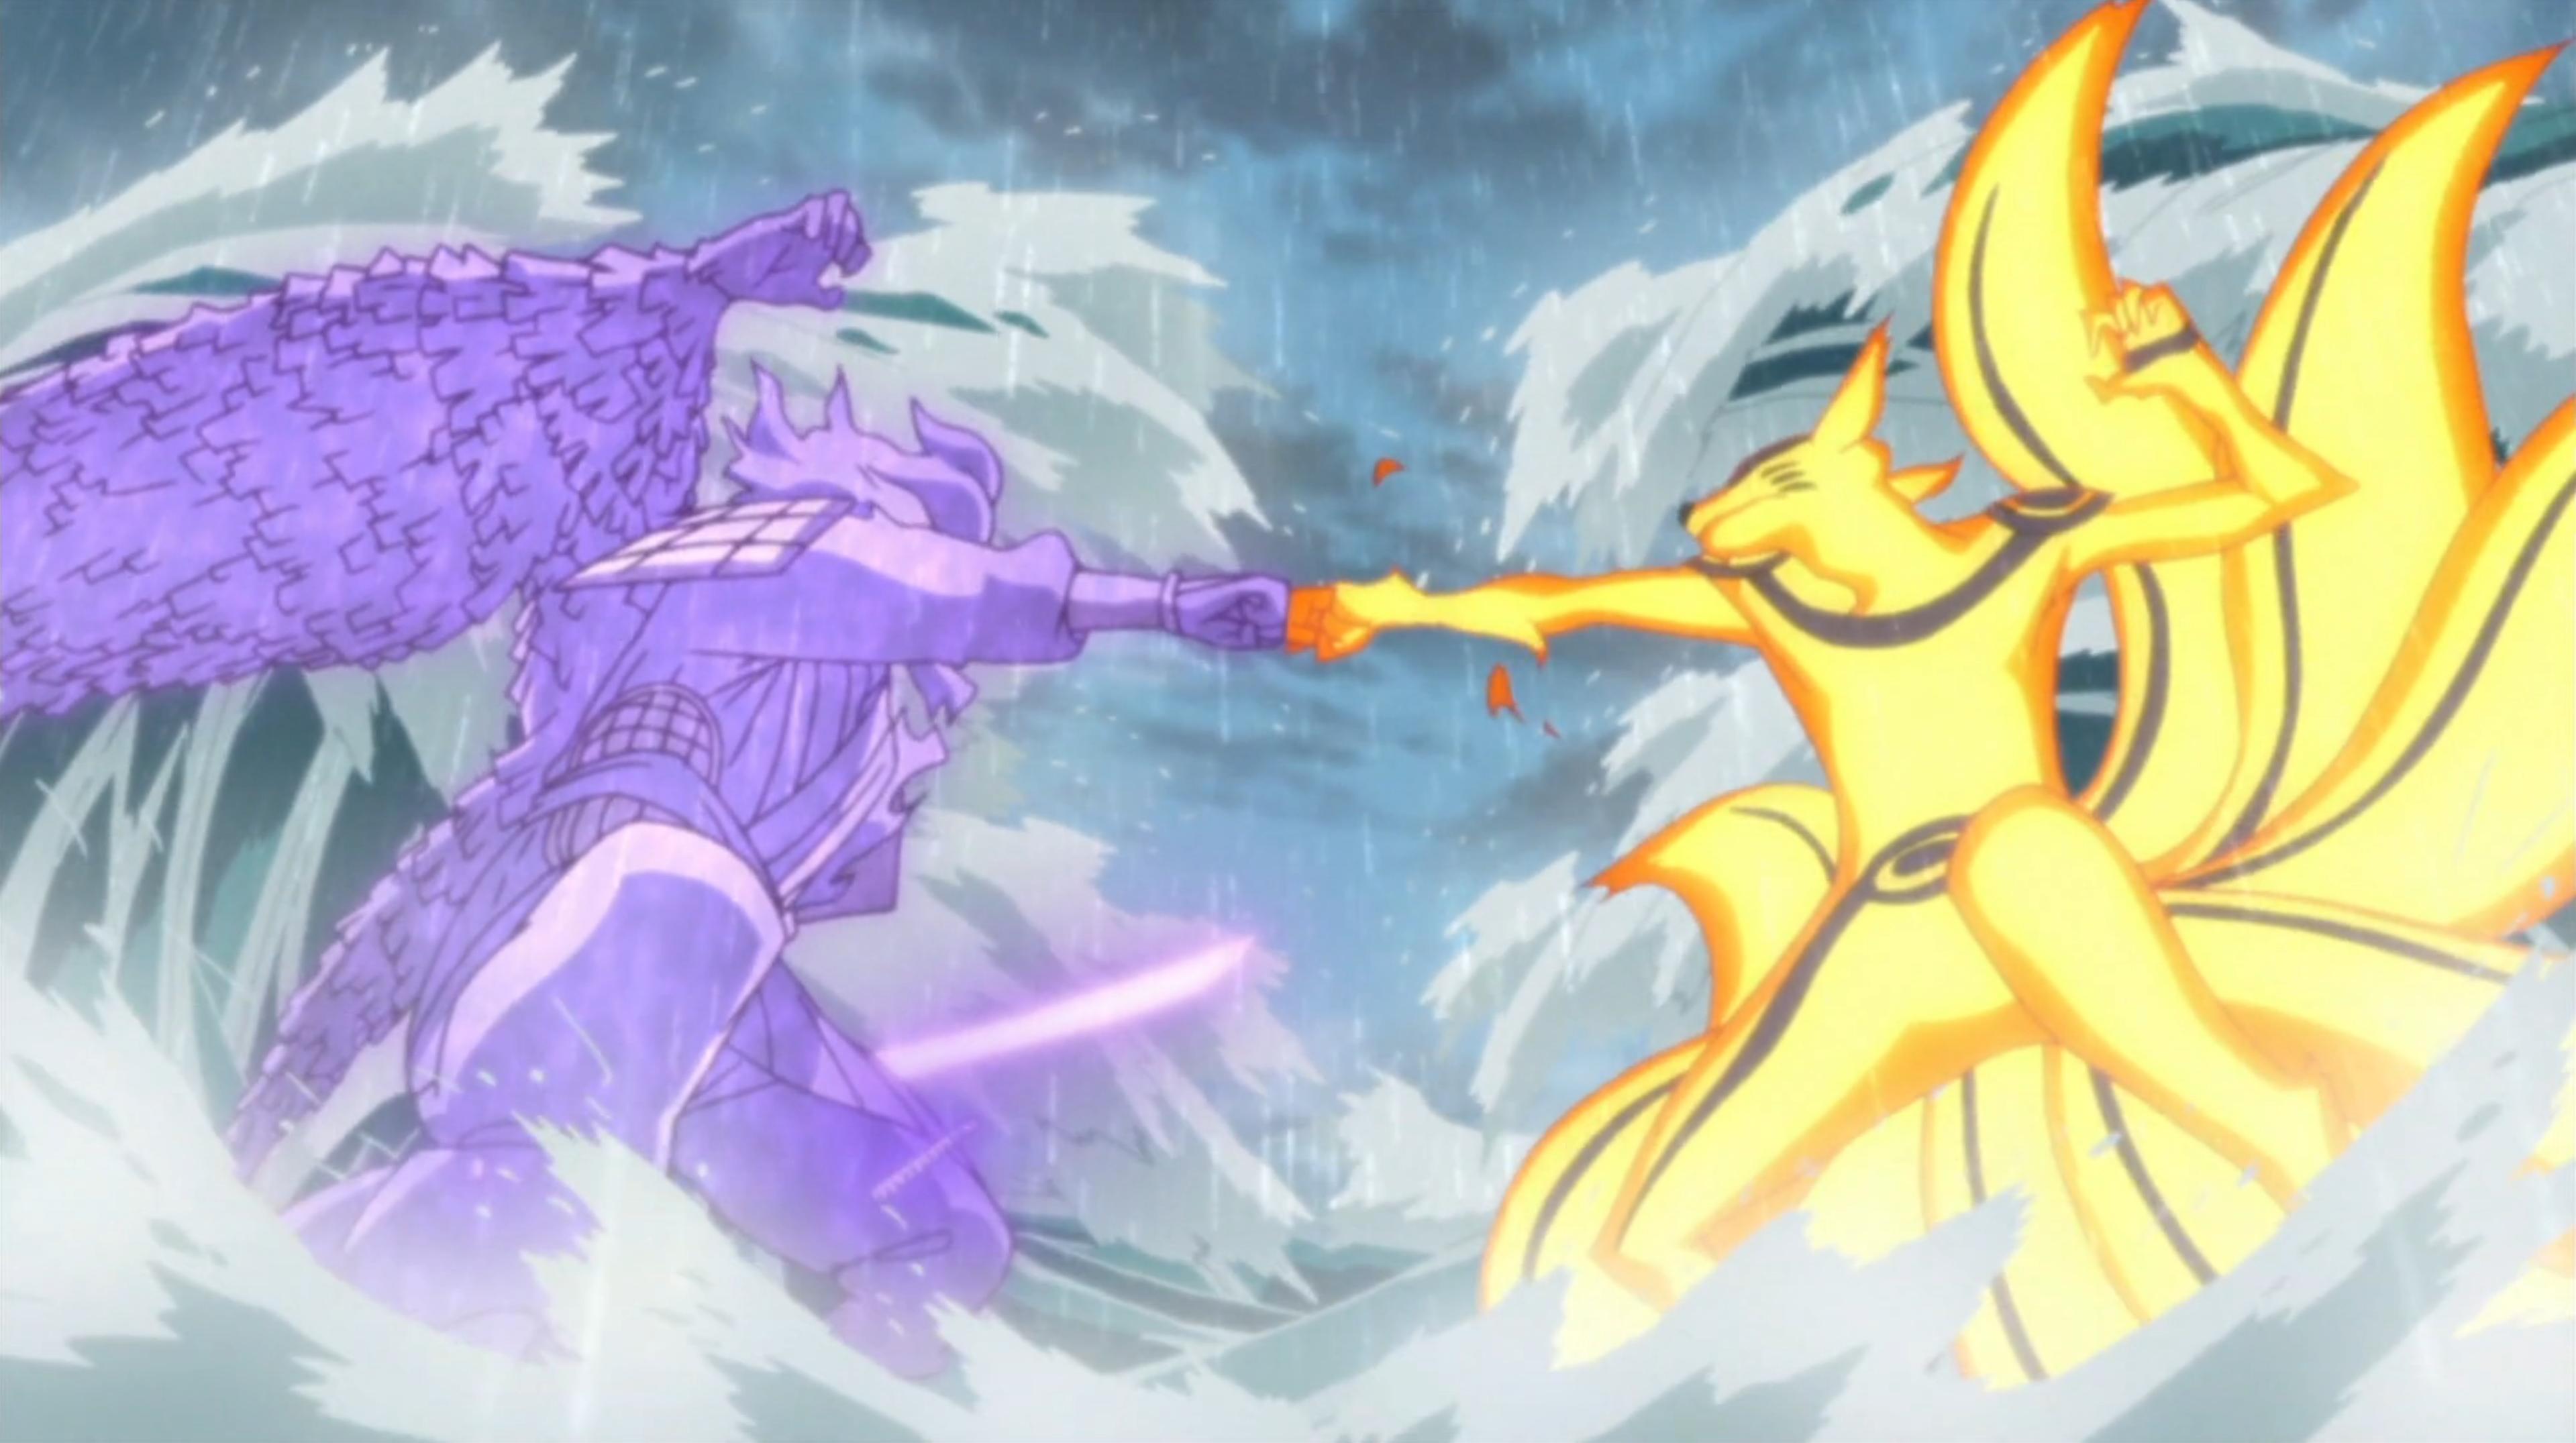 Did Sasuke Create a Bijuu? - Page 2 - Naruto Forums